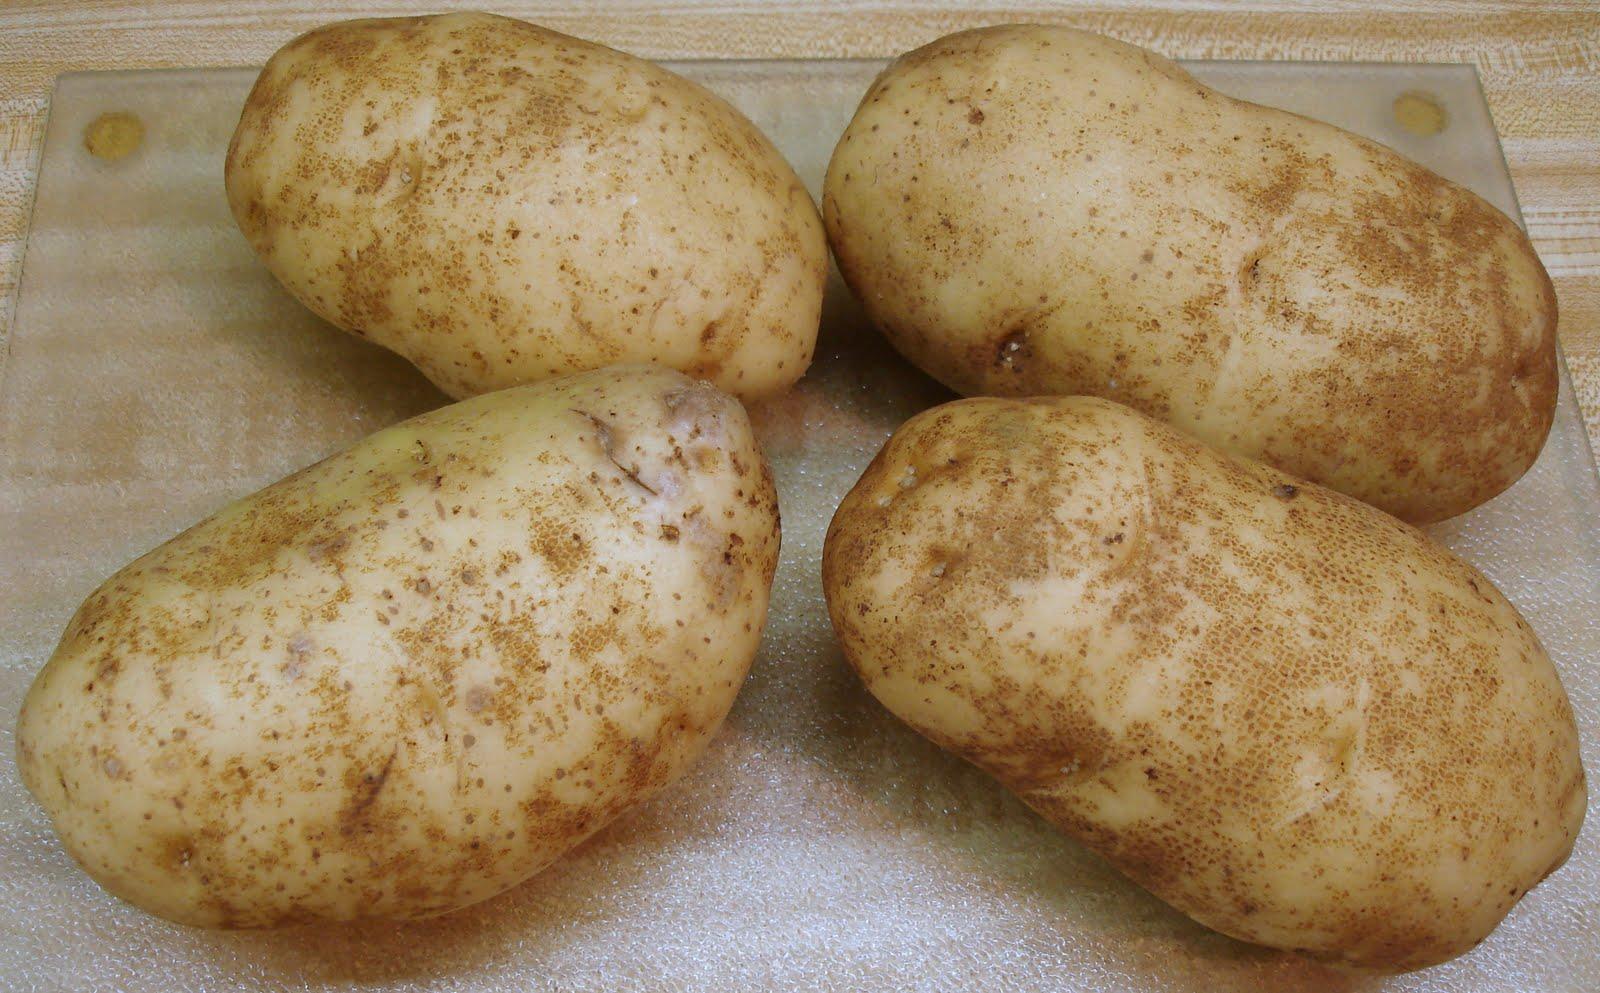 need slow cooker baking potatoes aluminum foil 2 paper towels